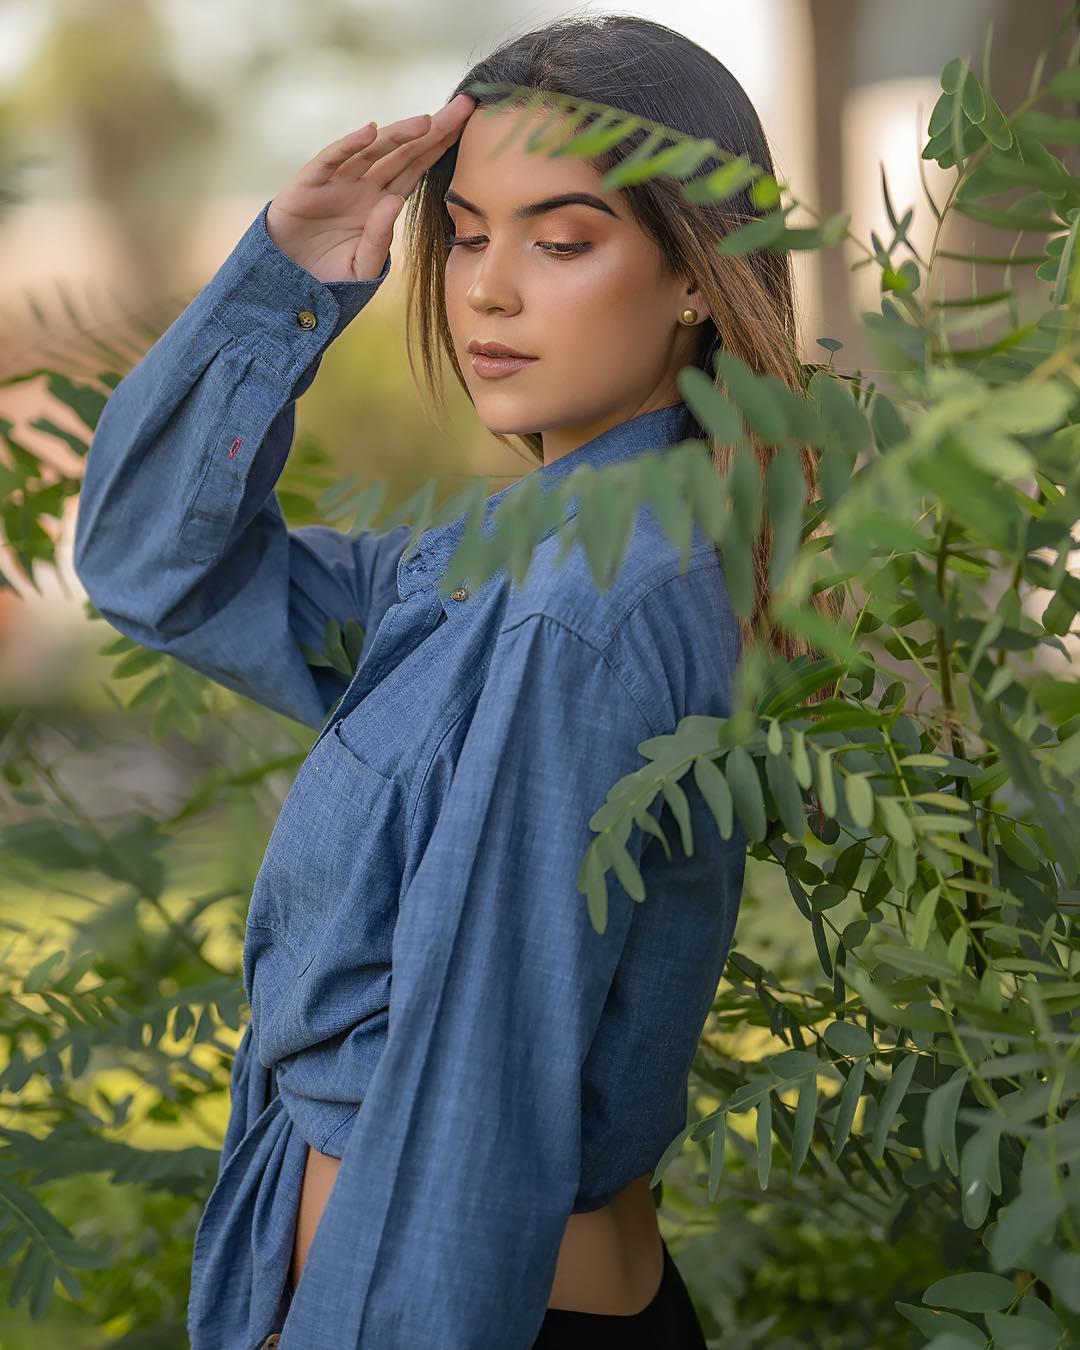 micaela leon mandriotti, miss peru latinoamerica 2019. - Página 2 53546010